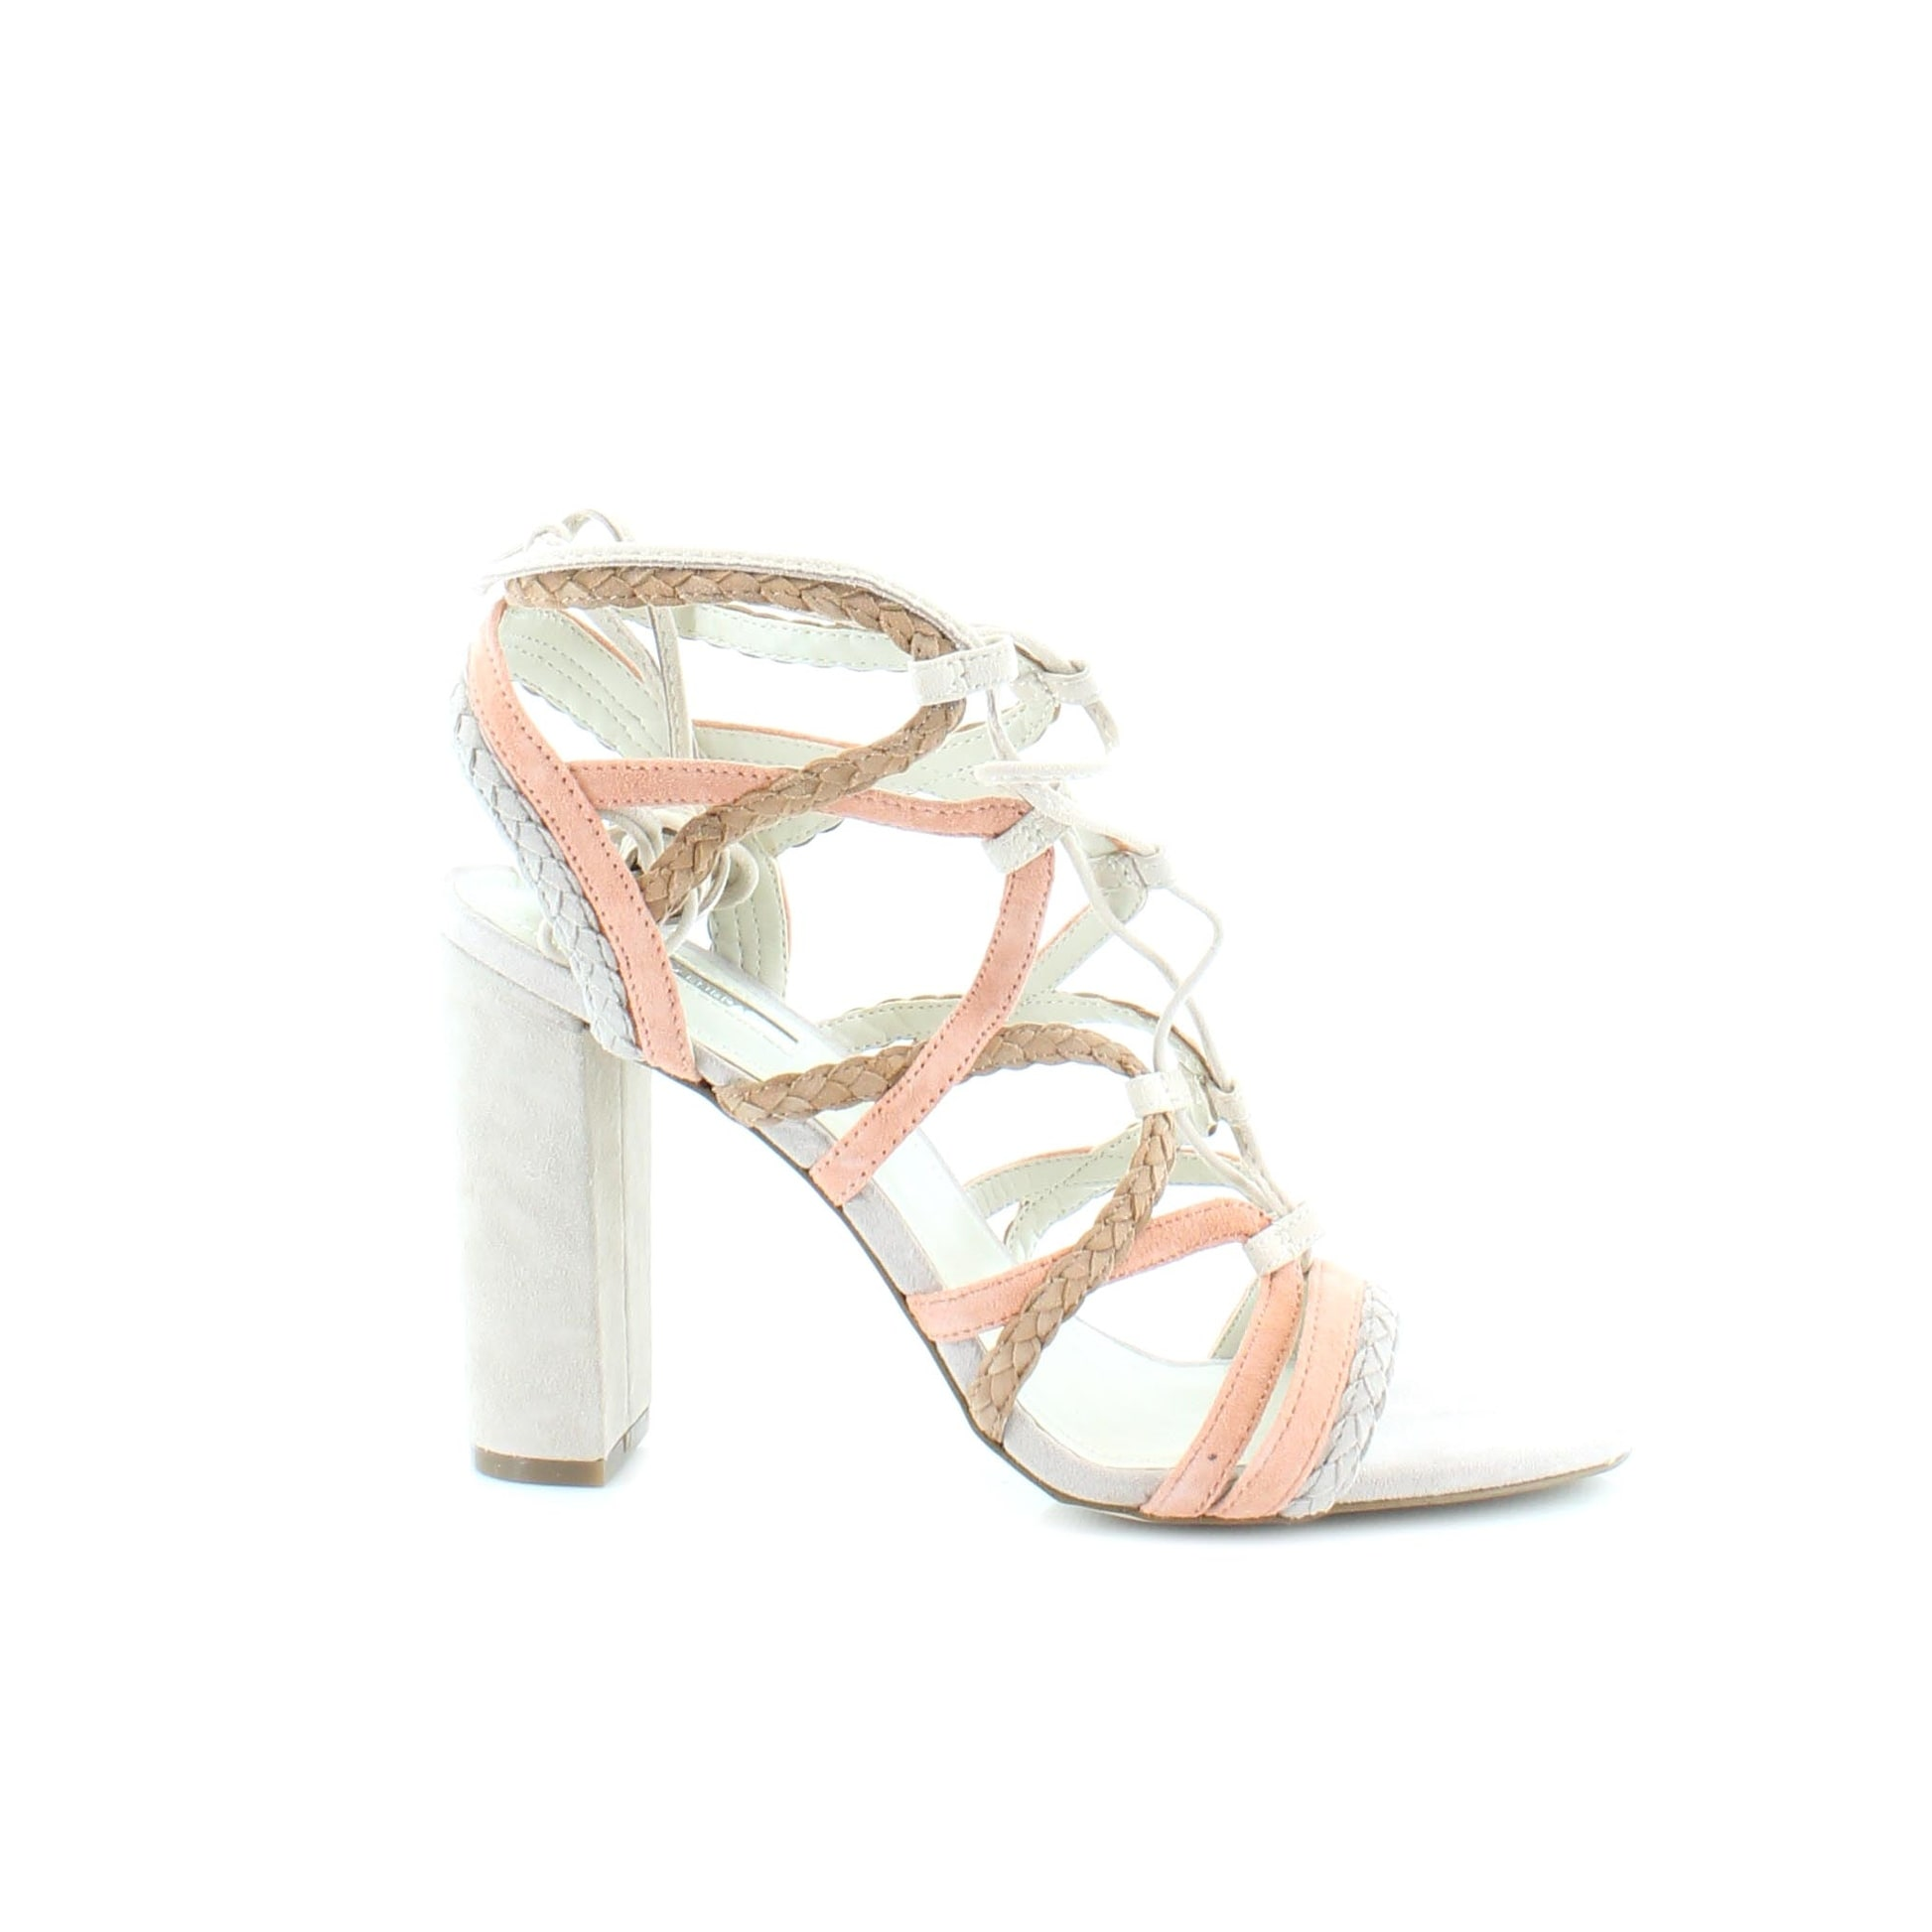 d341f53ca164 Shop BCBG Ronny Women s Heels Misty Hazel - 10 - Free Shipping On Orders  Over  45 - Overstock - 18289394